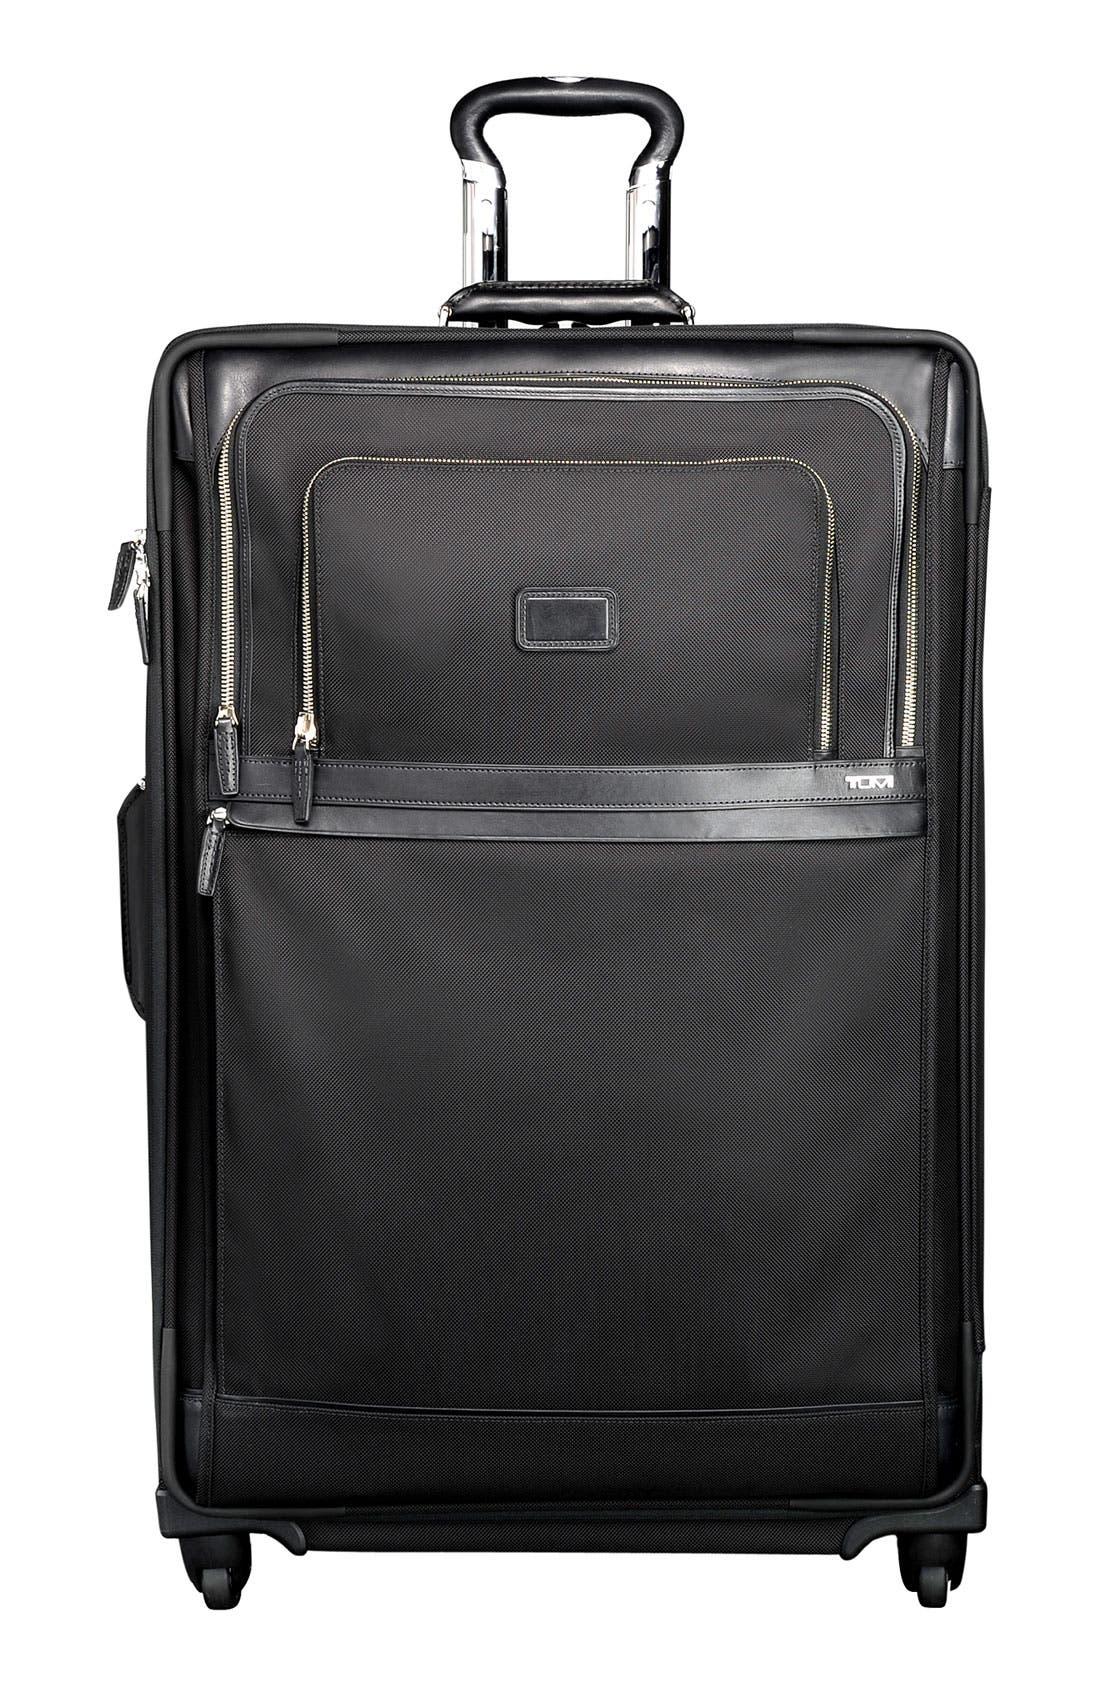 Main Image - Tumi 'Bedford - Paddock' 4-Wheeled Worldwide Trip Bag